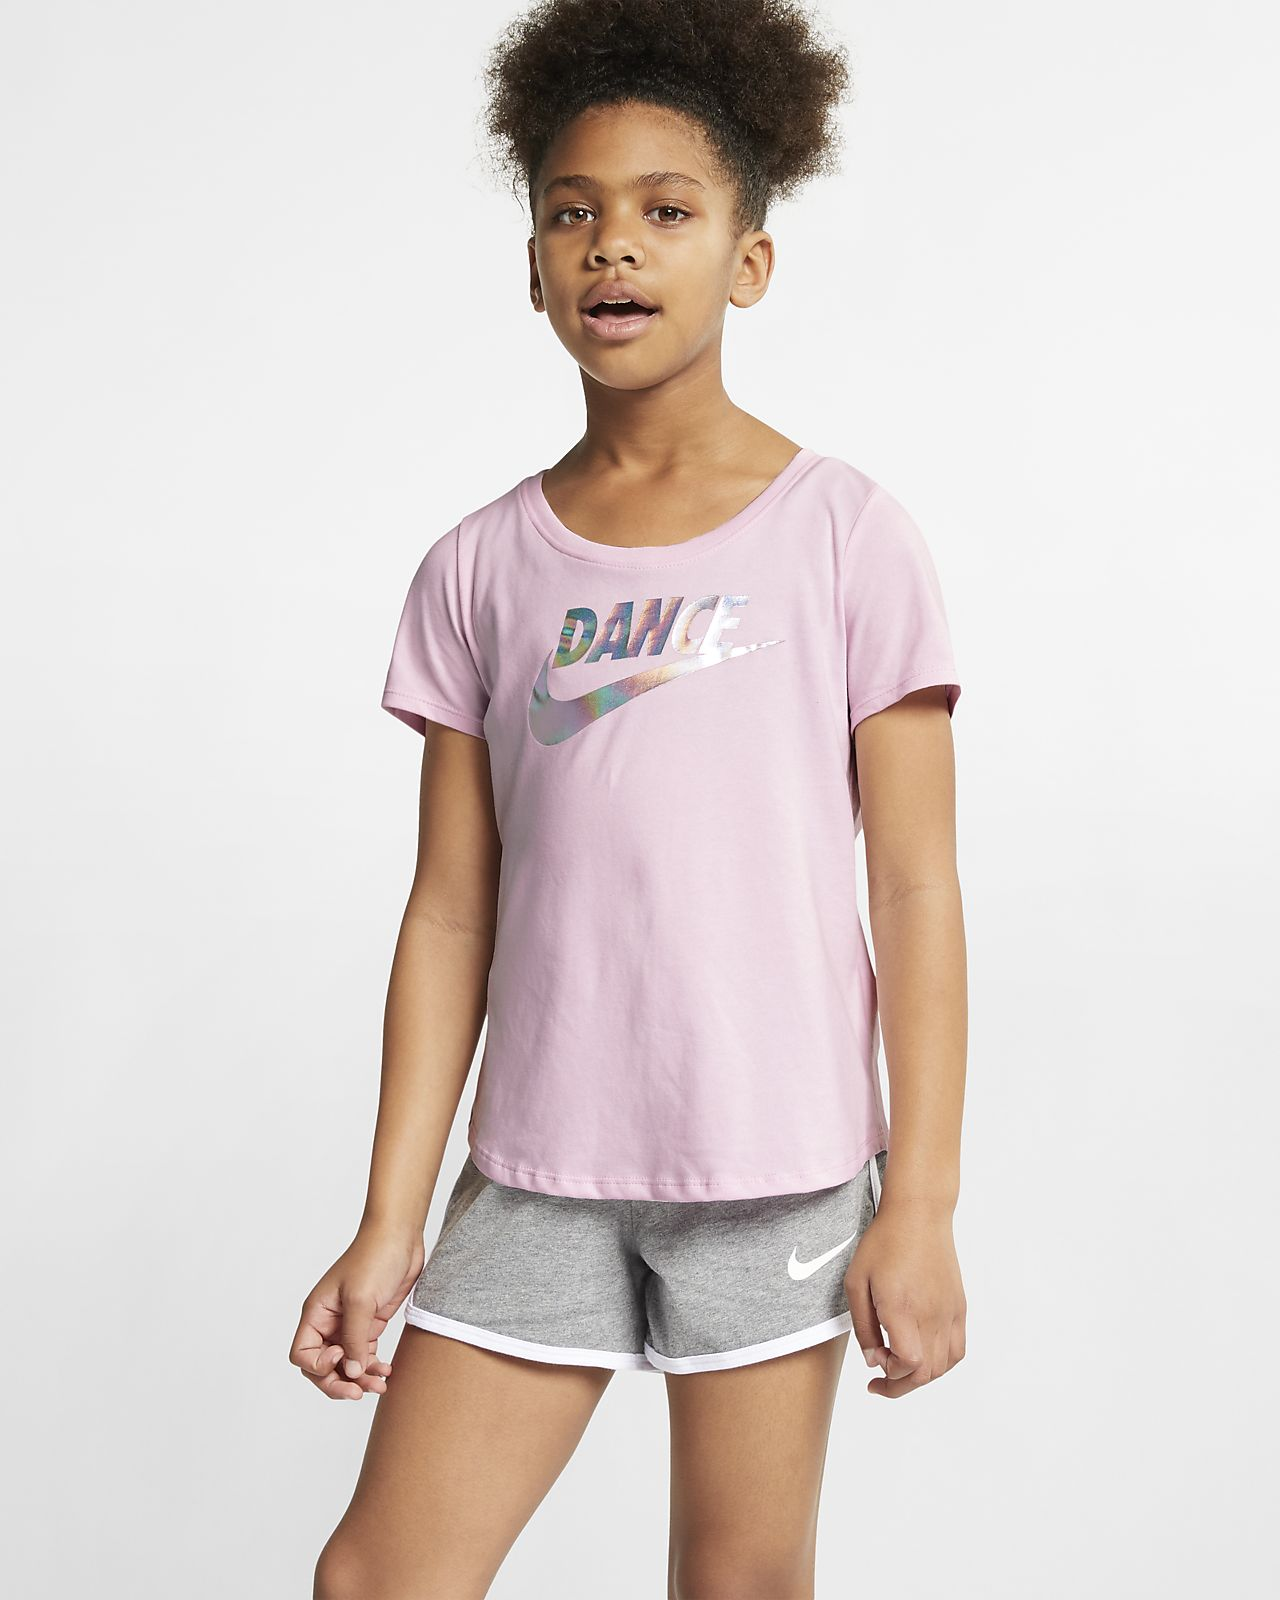 Nike Dri-FIT Older Kids' (Girls') T-Shirt